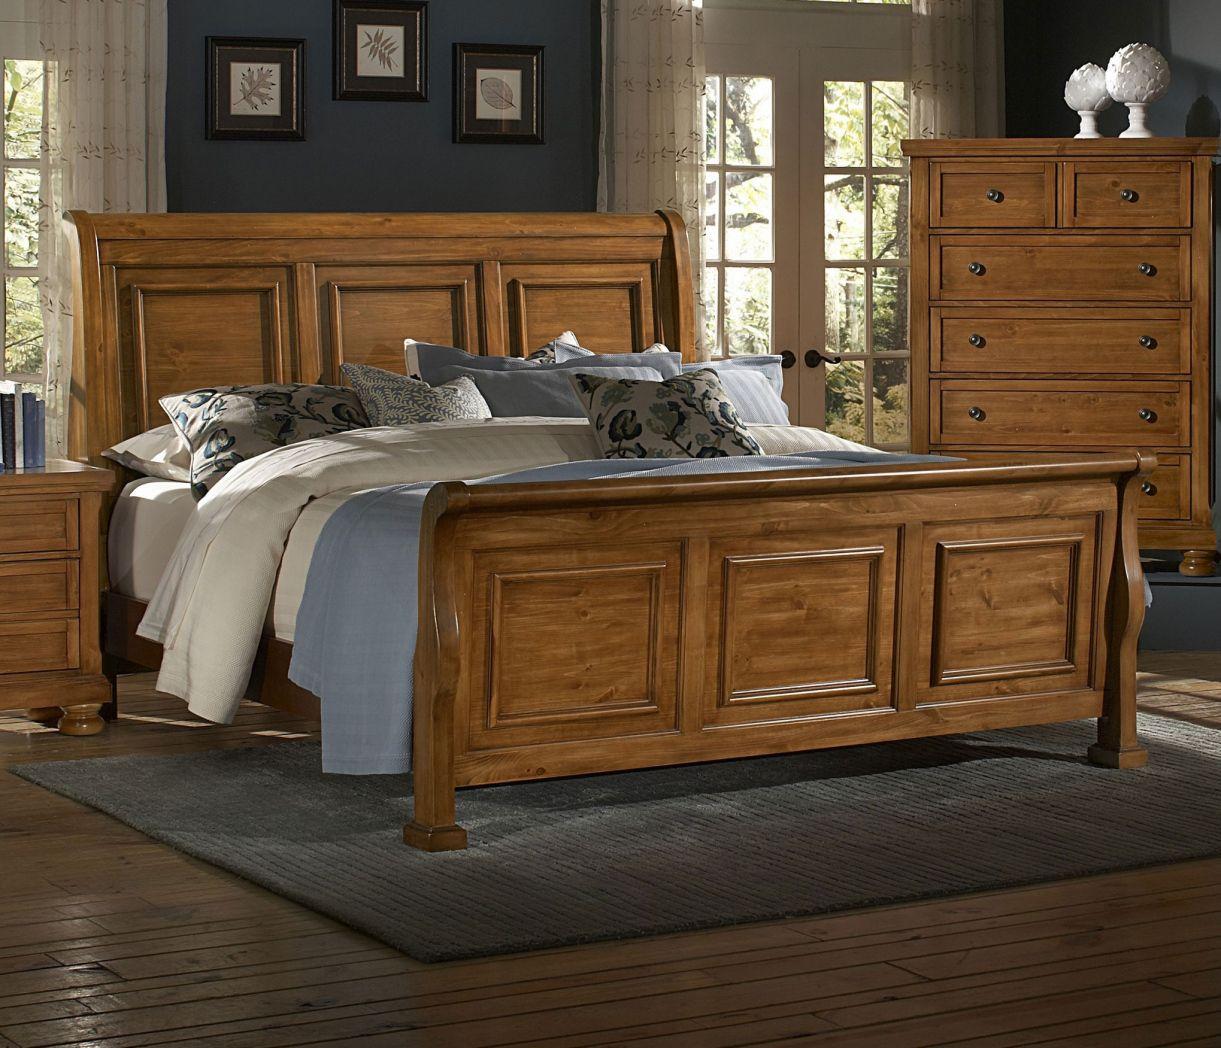 Vaughan Bassett Bedroom Furniture Reviews Interior Bedroom - Vaughan bassett bedroom furniture reviews